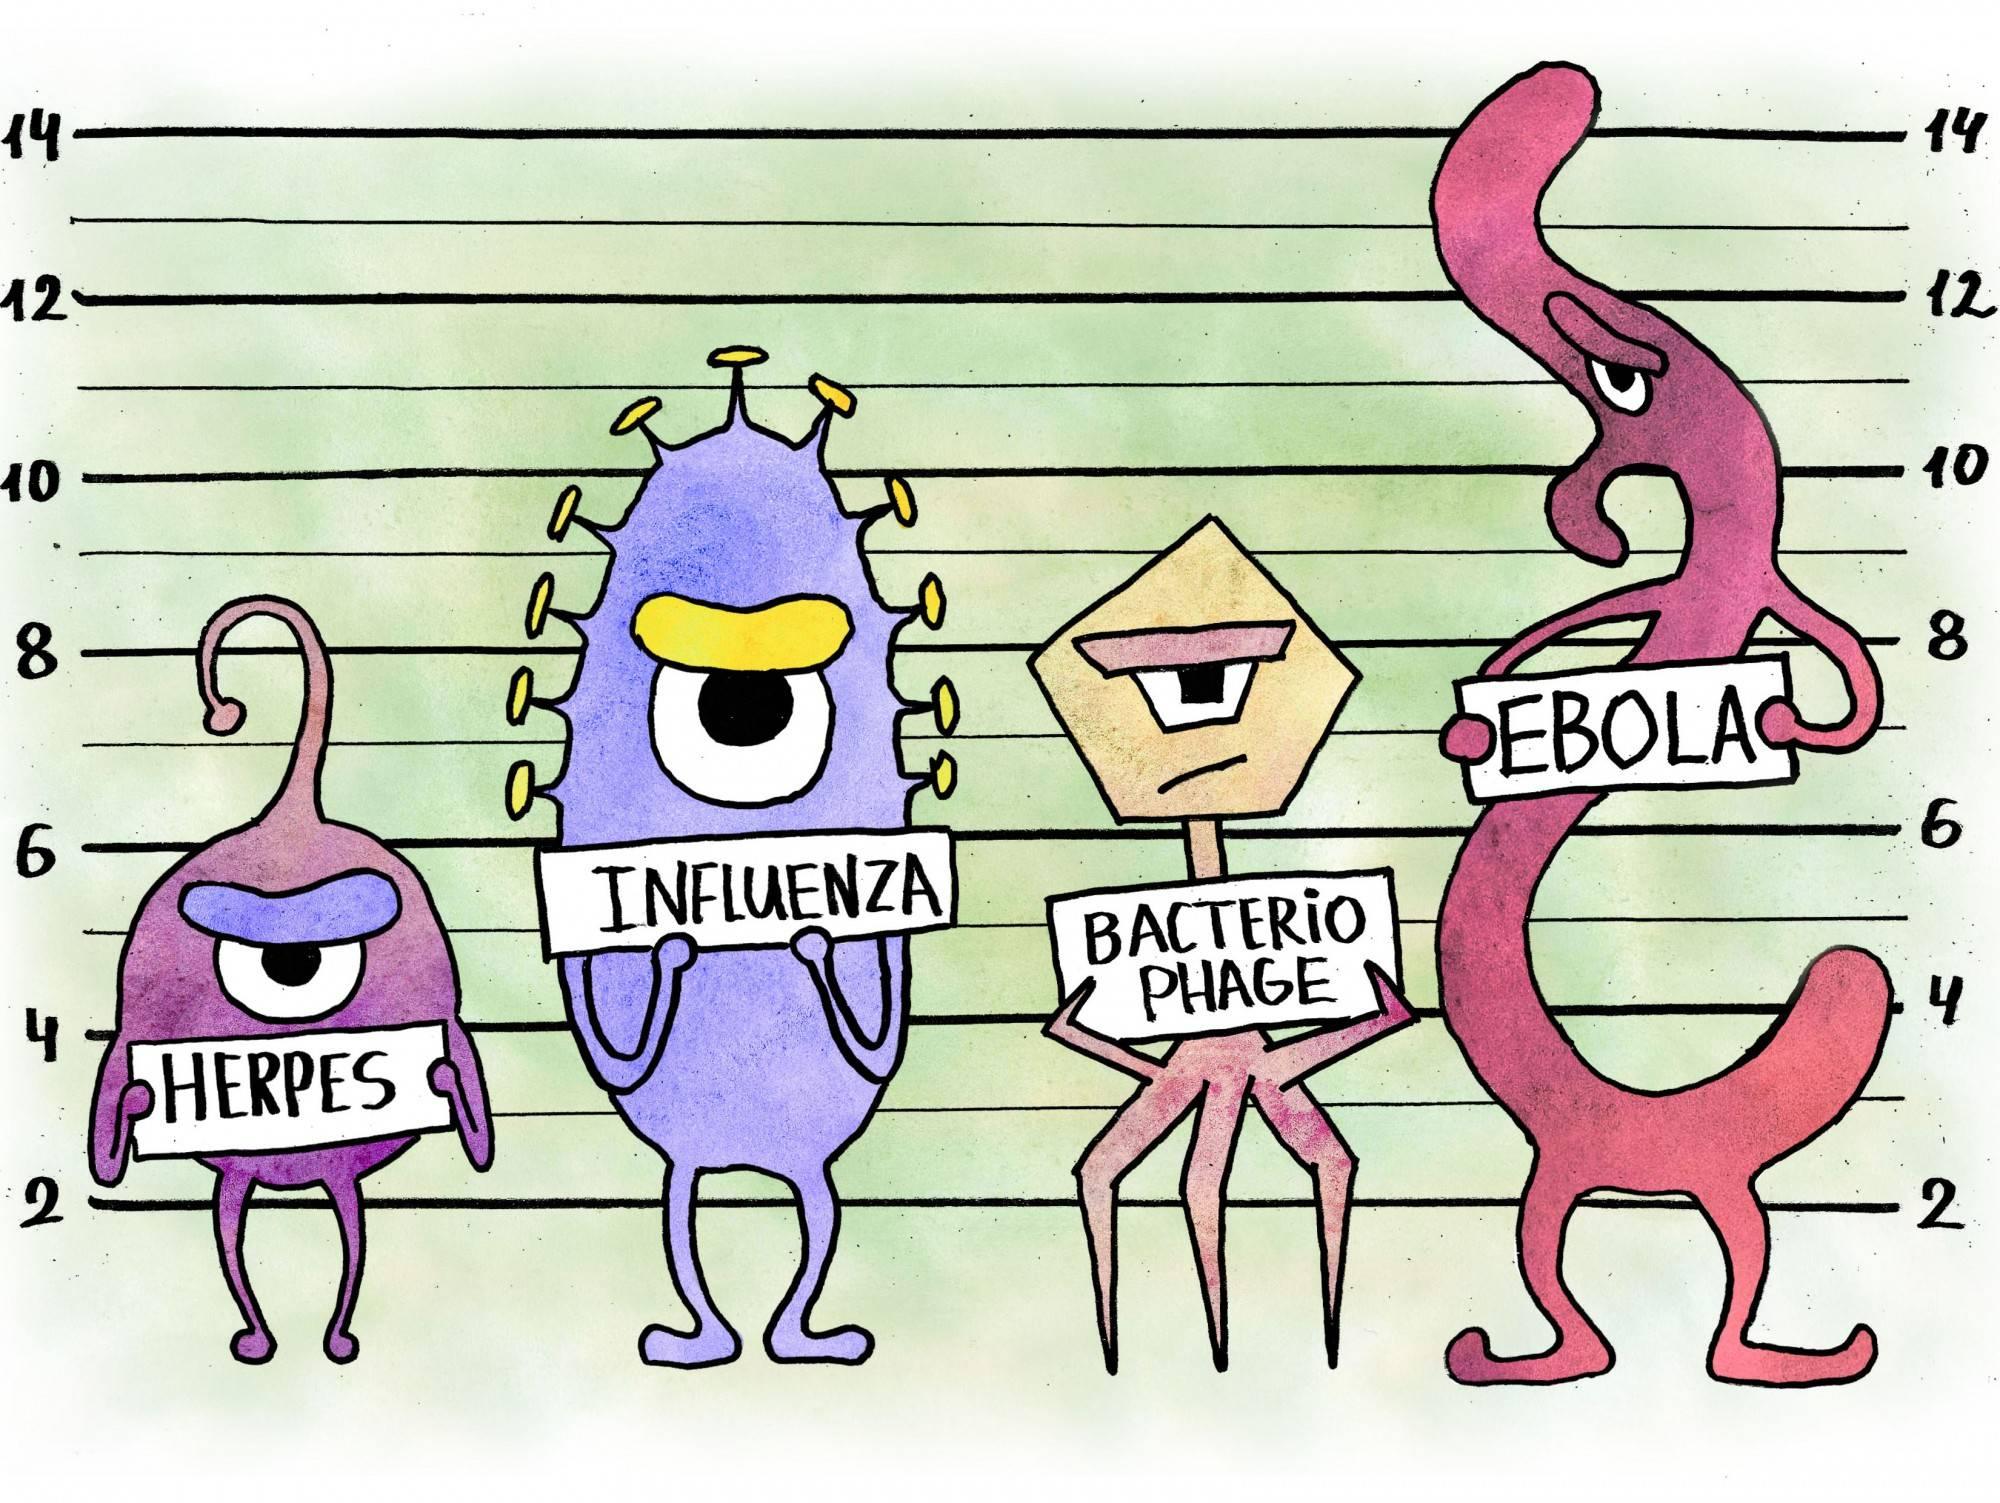 Сколько времени живет вирус спид вне организма